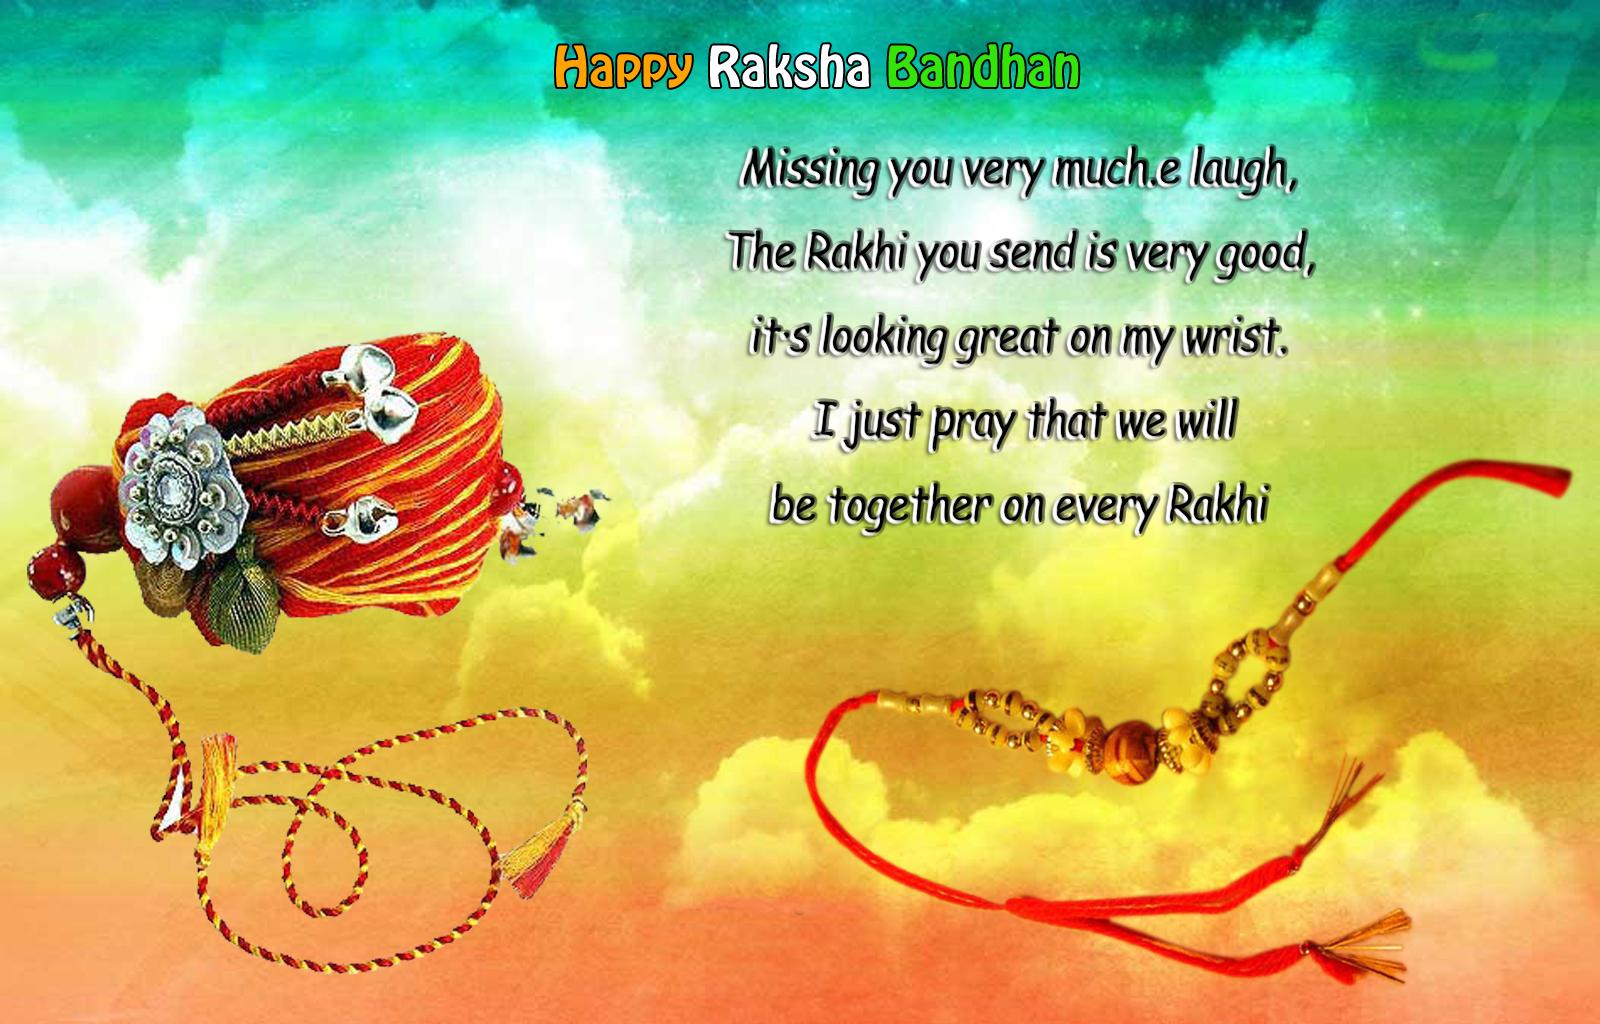 Rakhi Festival Quotes Brother: Rakhi Festival: The Loving Bond Between Brother & Sisters